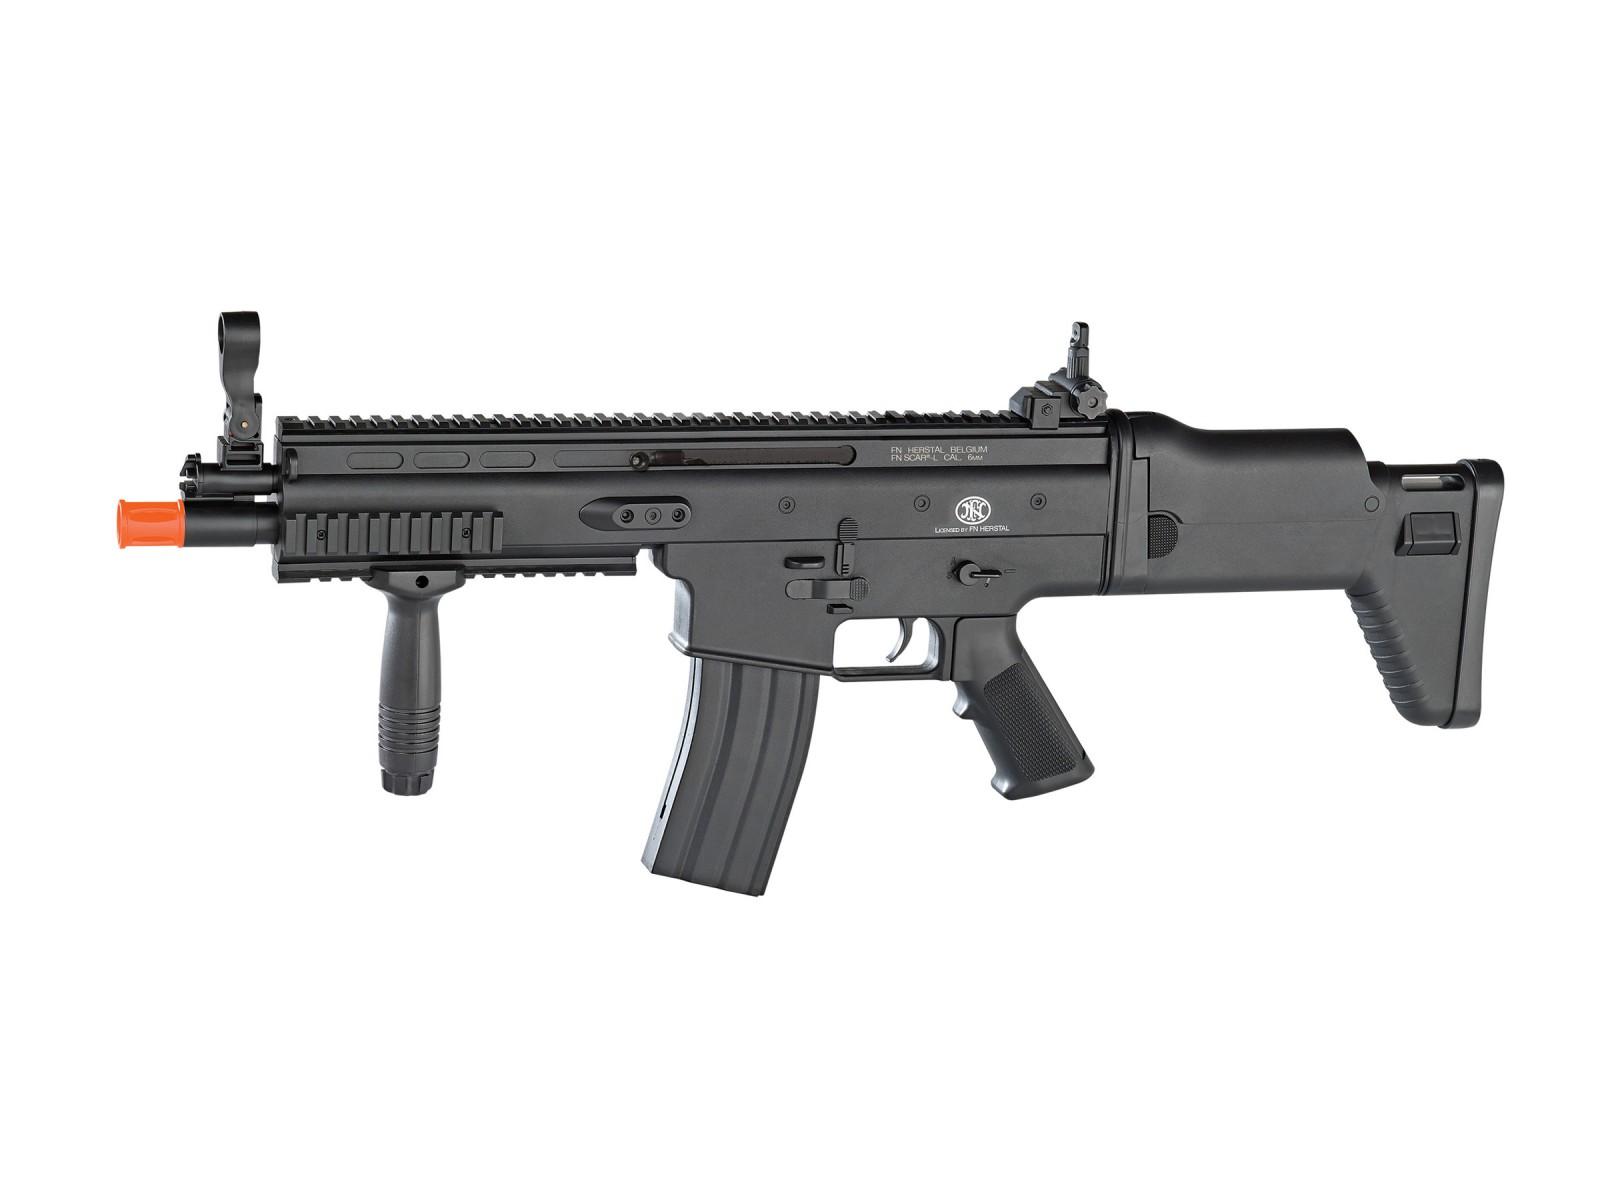 FN Herstal SCAR-L Spring Airsoft Rifle, Black 6mm